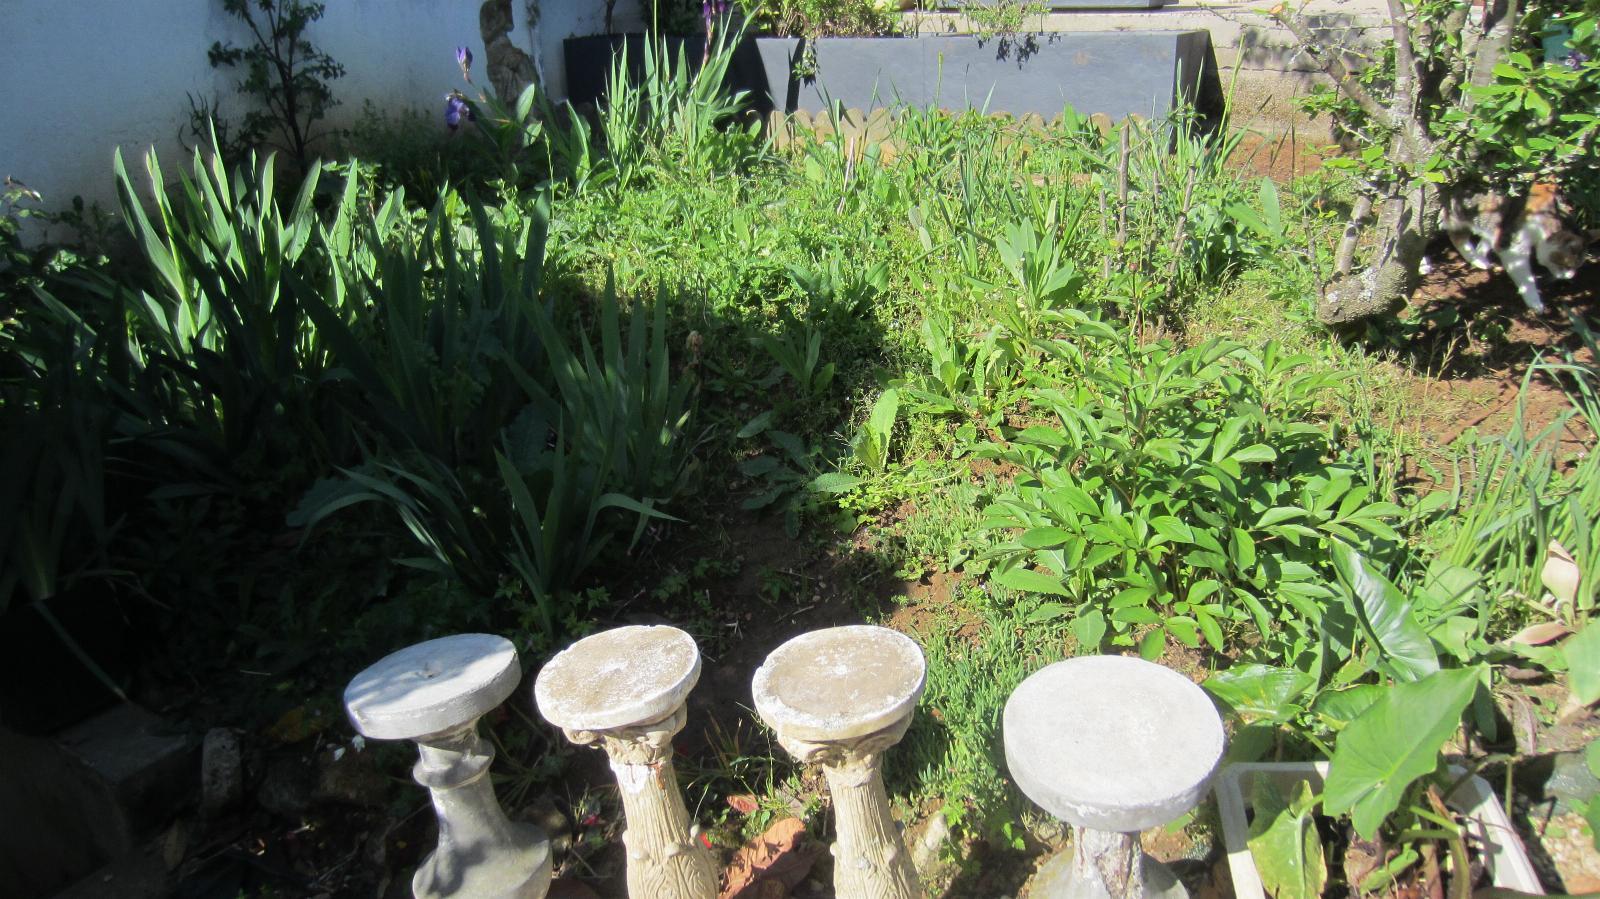 Planter Herbes Aromatiques Jardiniere matin lumineux: août 2019